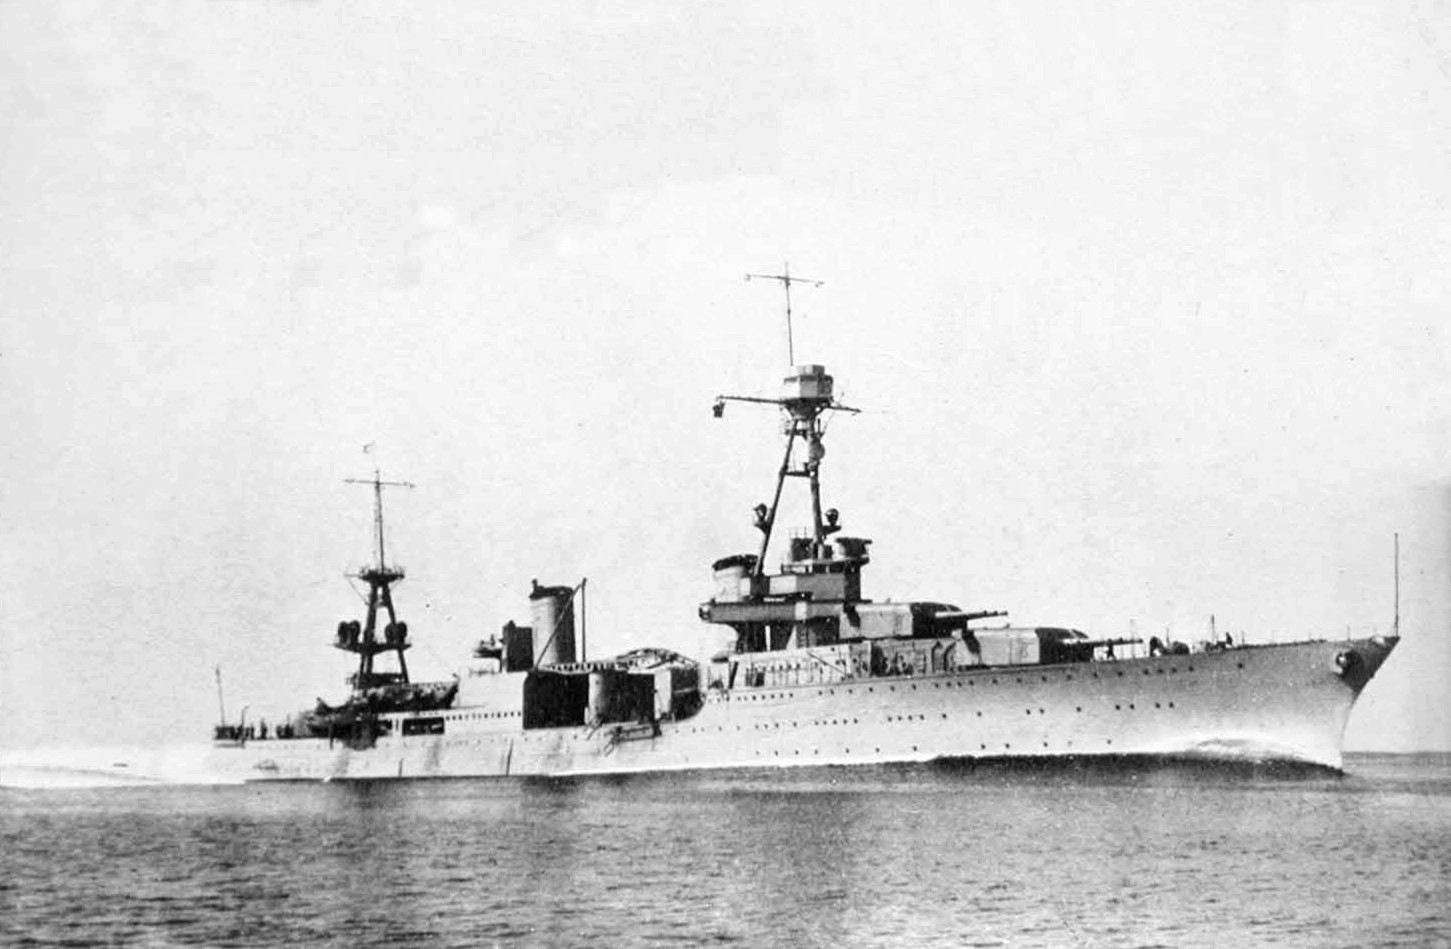 <b>ノーザンプトン</b>級重巡洋艦 - Wikipedia